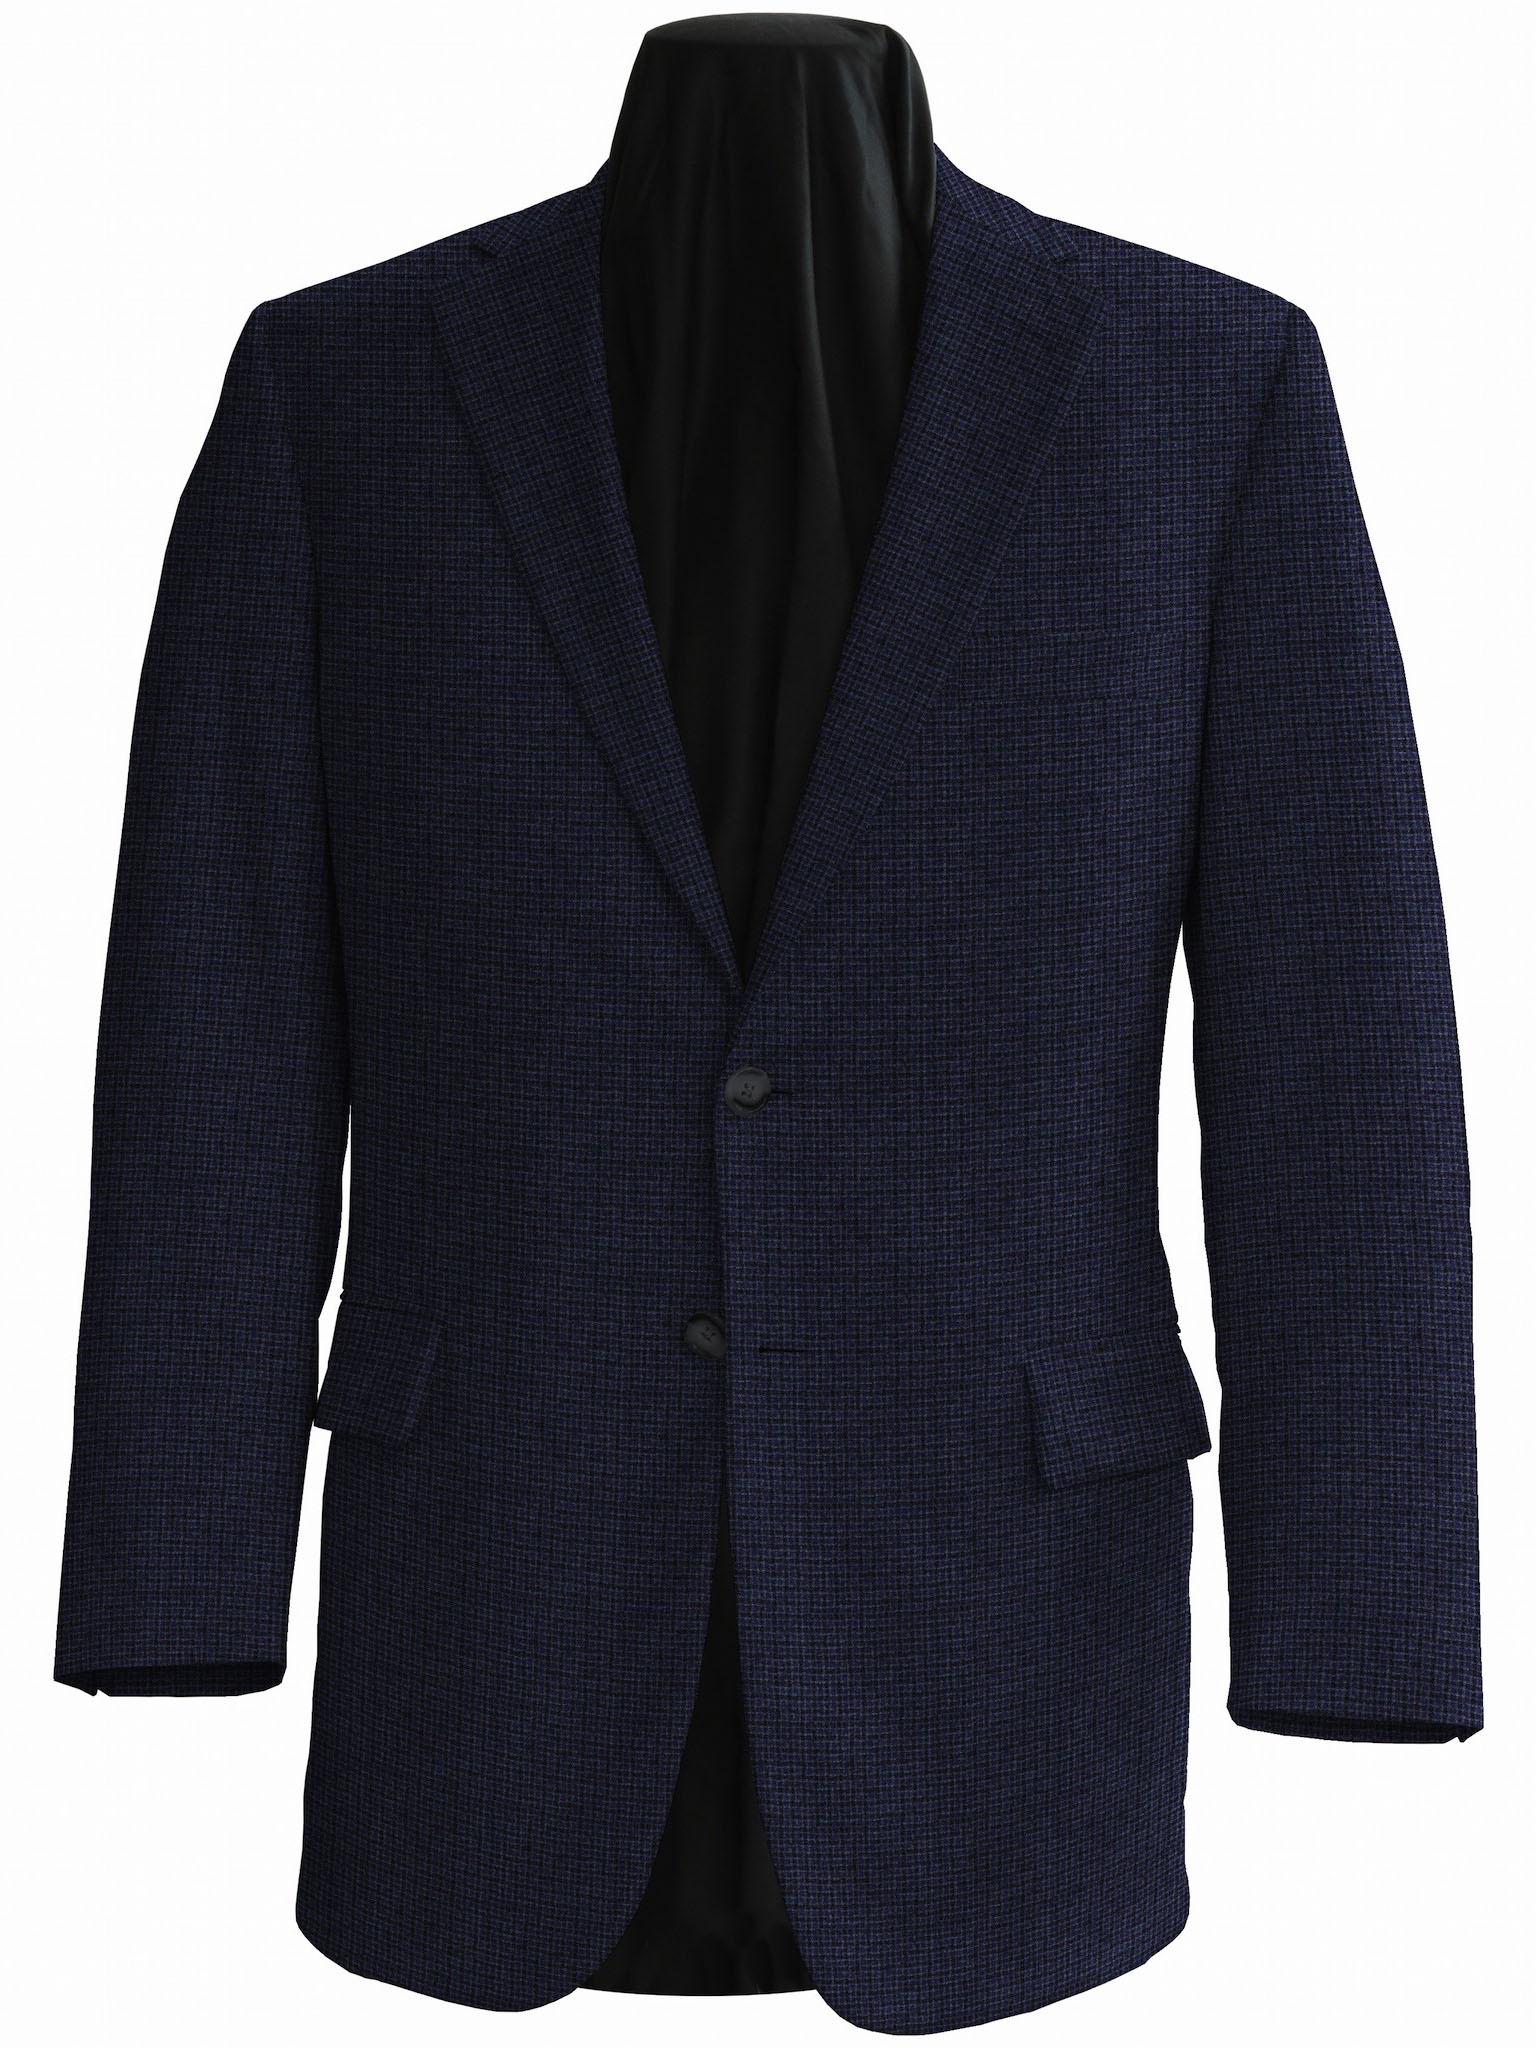 Sherry Kash Jackets Ltd Edition 904009